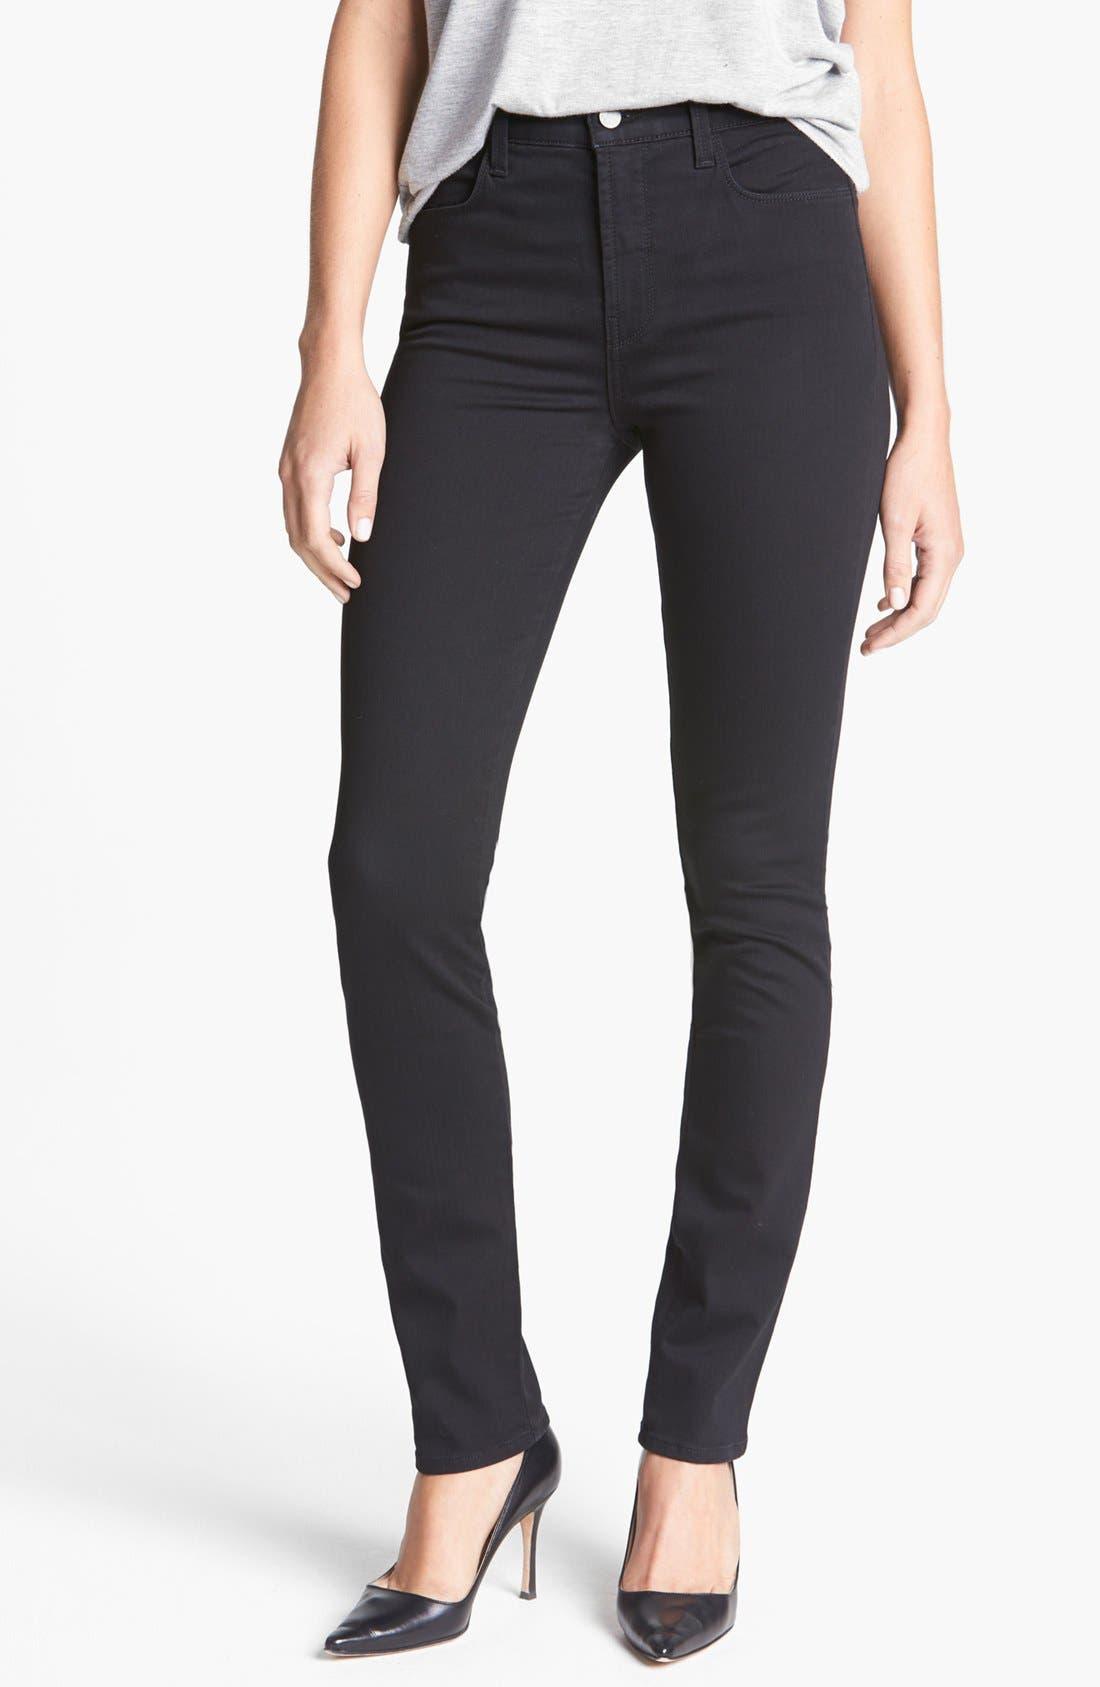 Alternate Image 1 Selected - J Brand '2112 Rail' High Rise Skinny Jeans (Hewson)